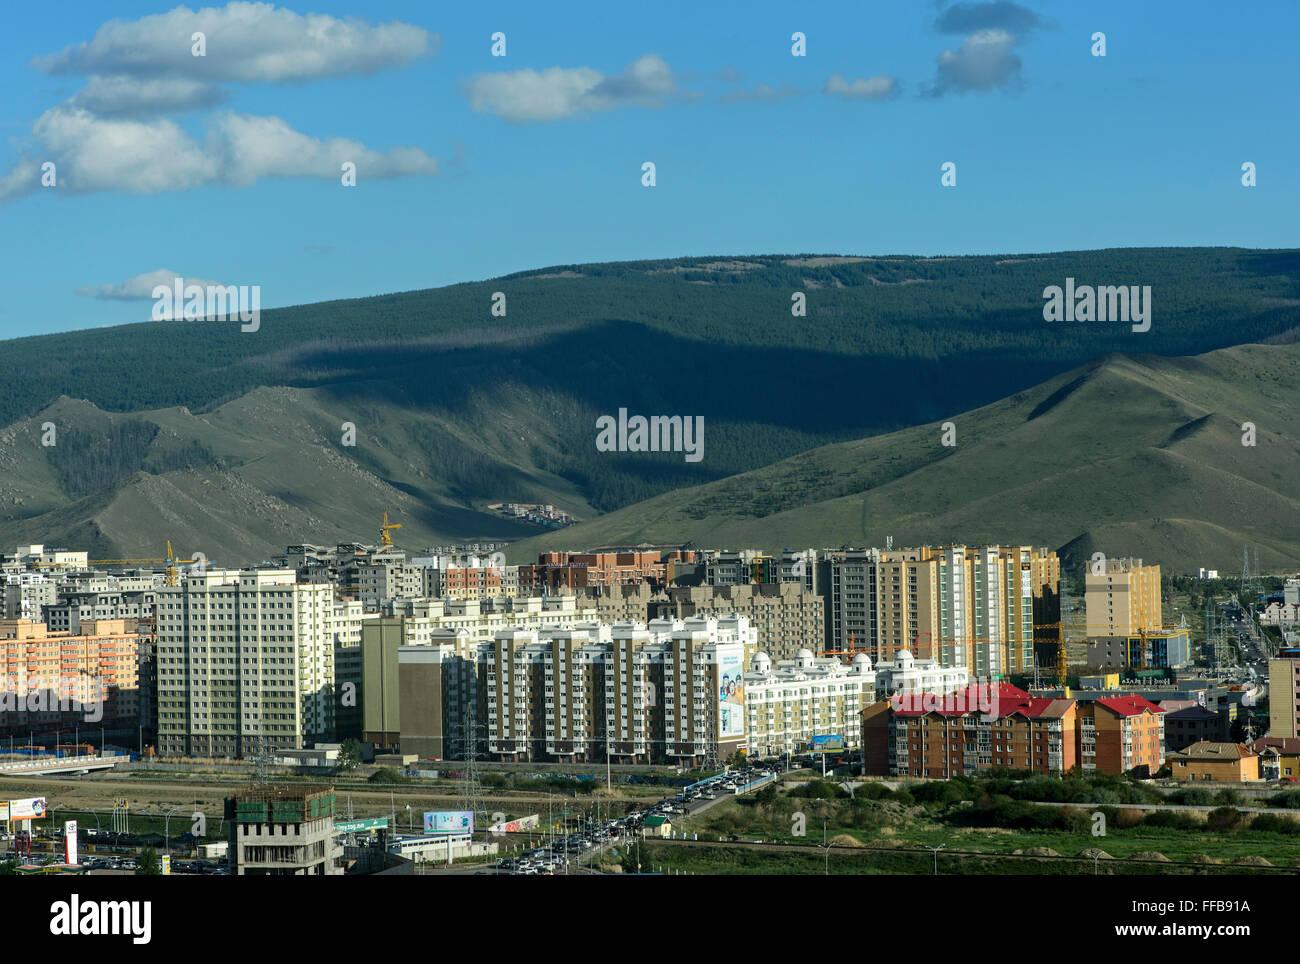 Neubau Wohngebiet, Ulan Bator, Mongolei Stockbild